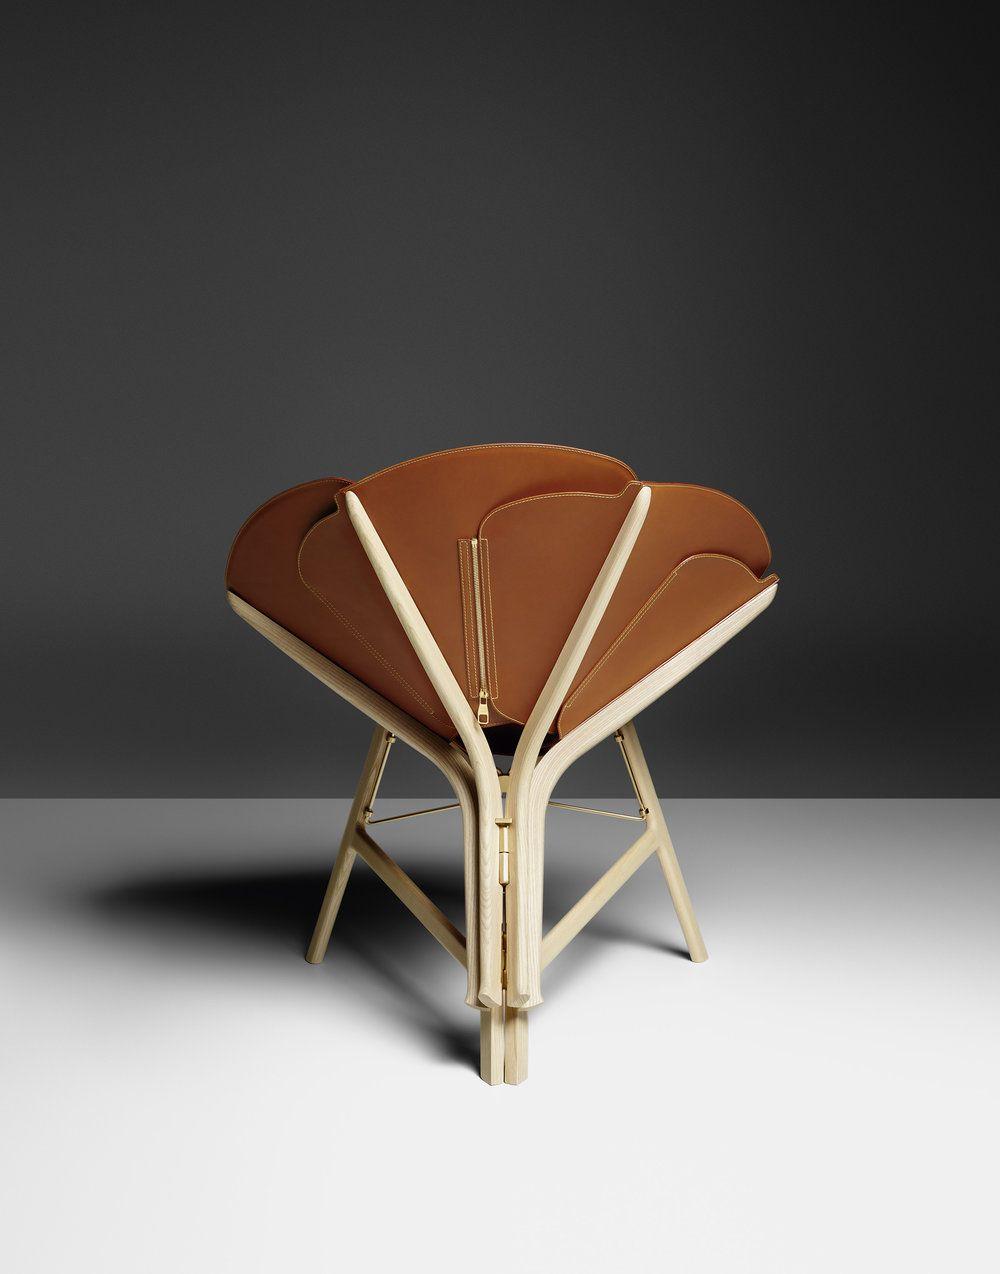 EdgesId Lighting Chair Concertina Table Furniture — Raw And TwXPiuOkZ